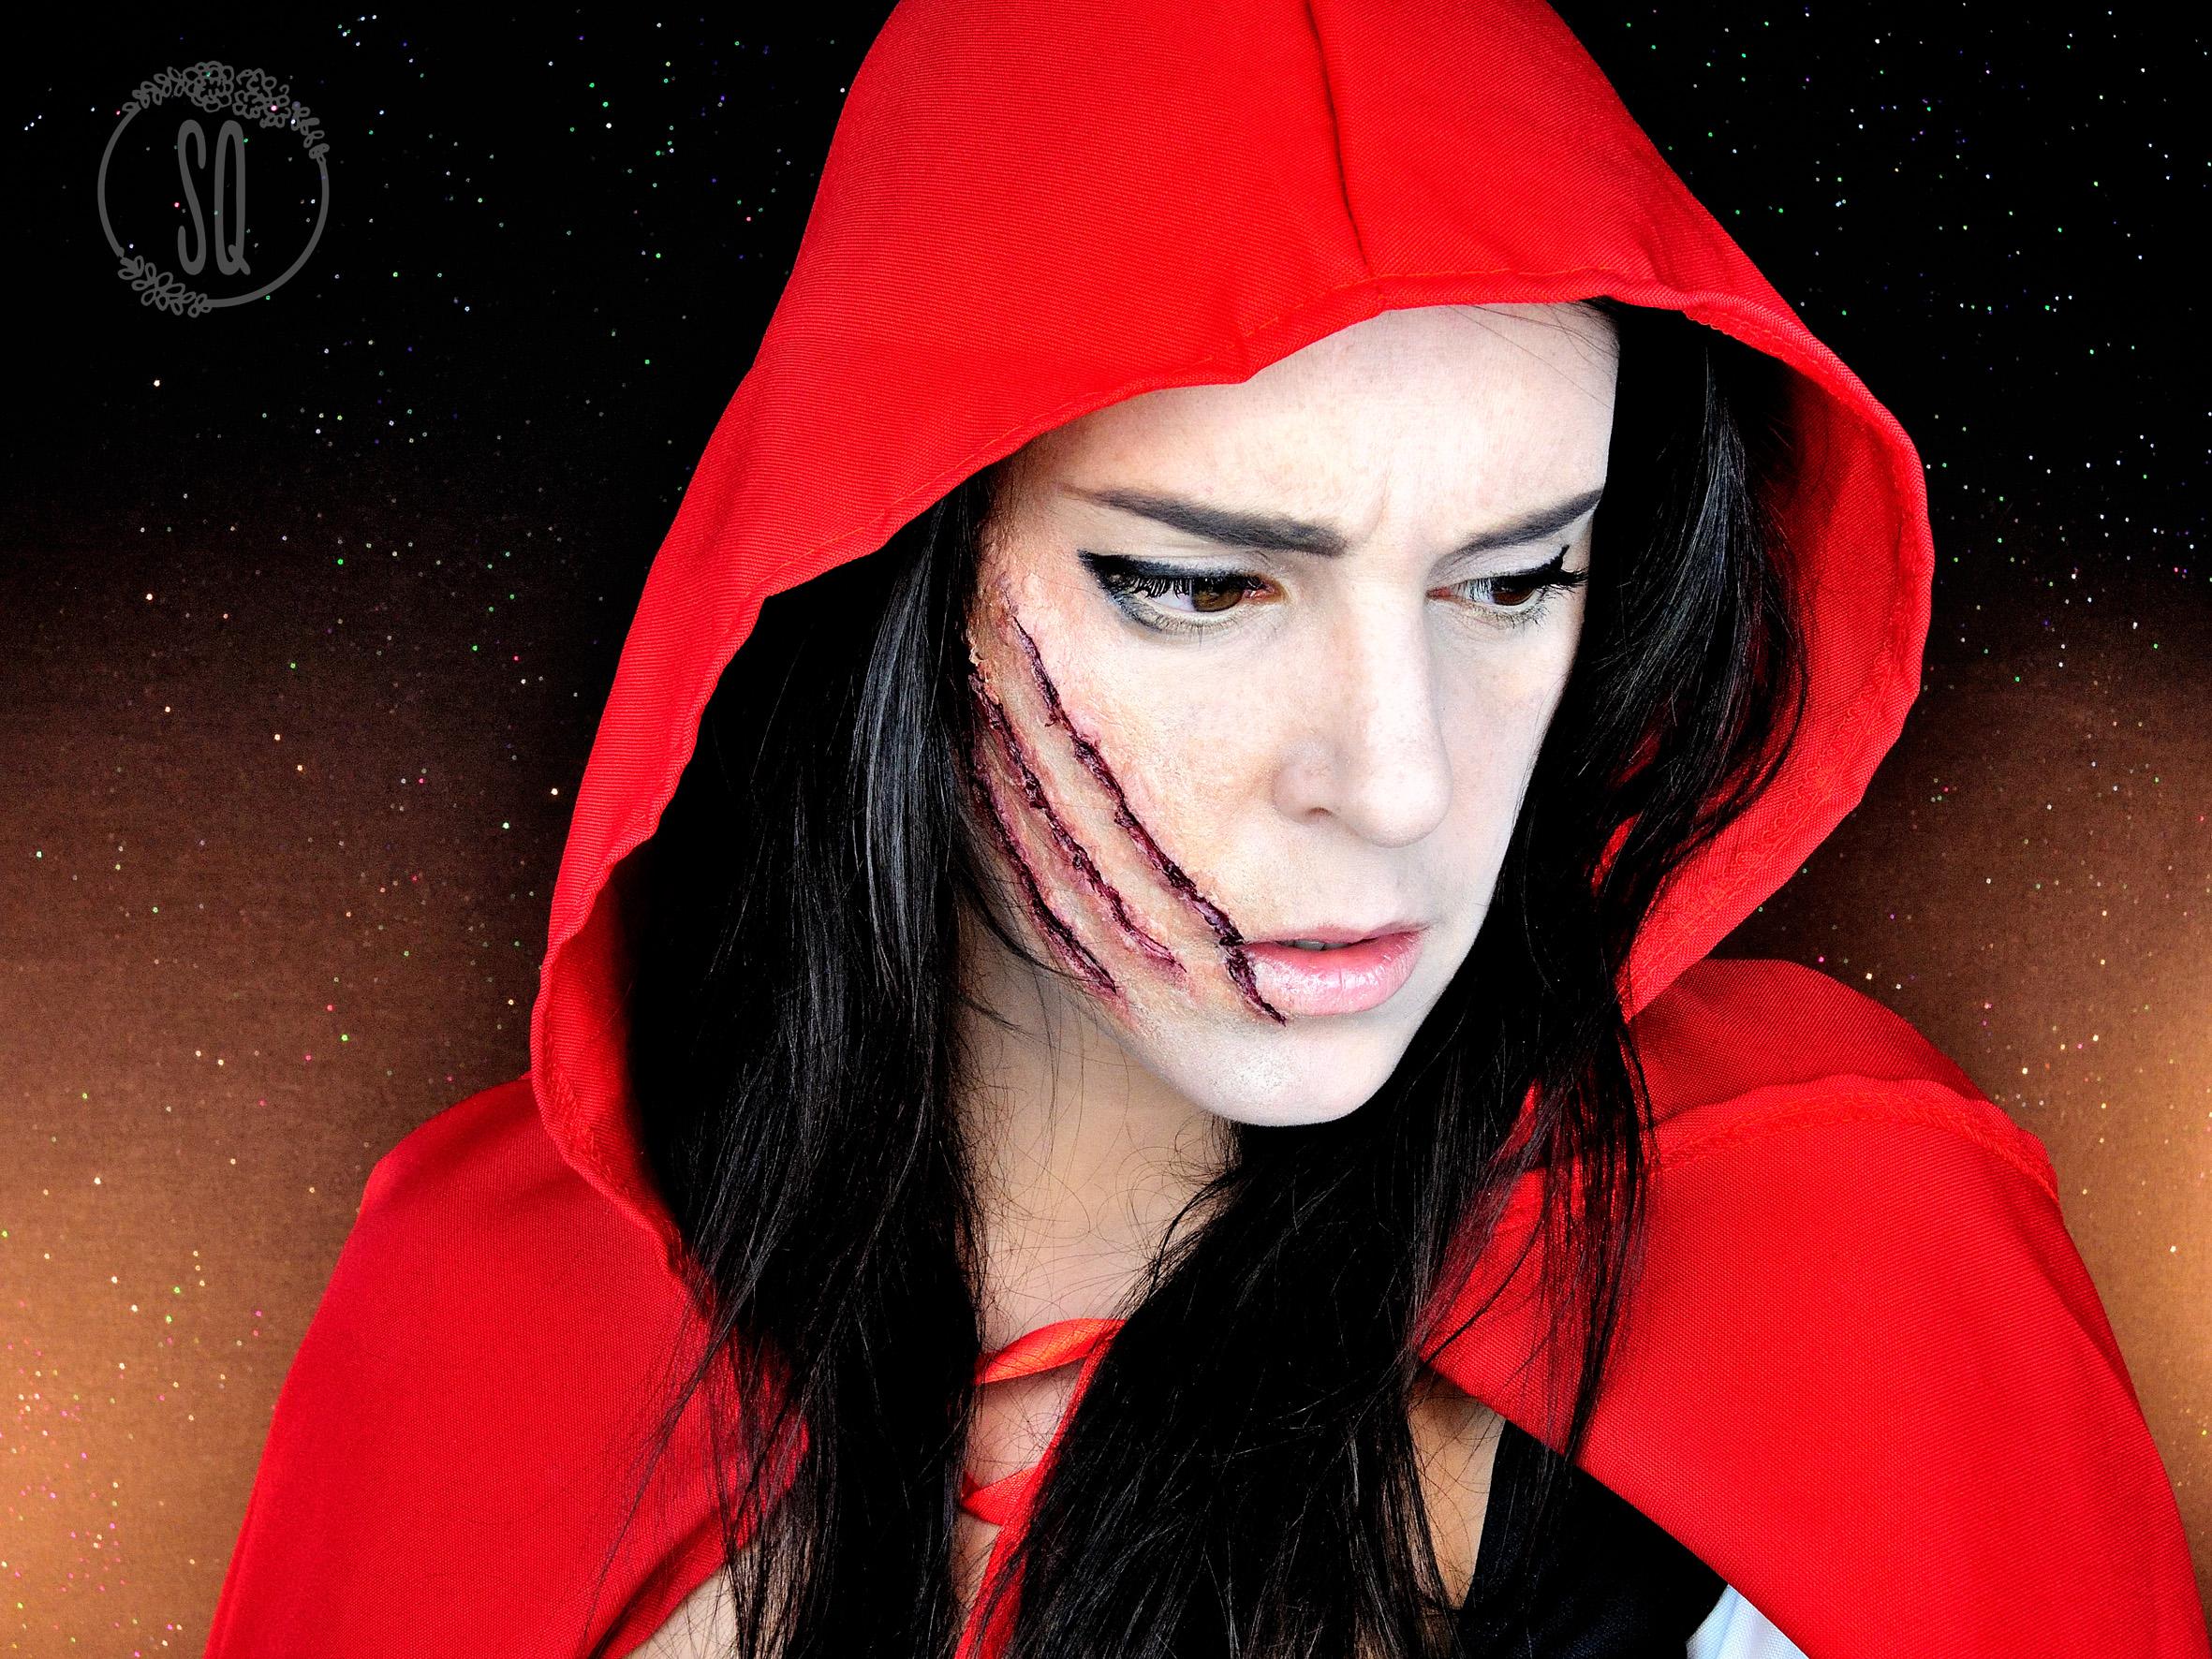 Caperucita Roja Halloween.Caperucita Roja Personaje De Cuentos 1 Maquillaje Fx